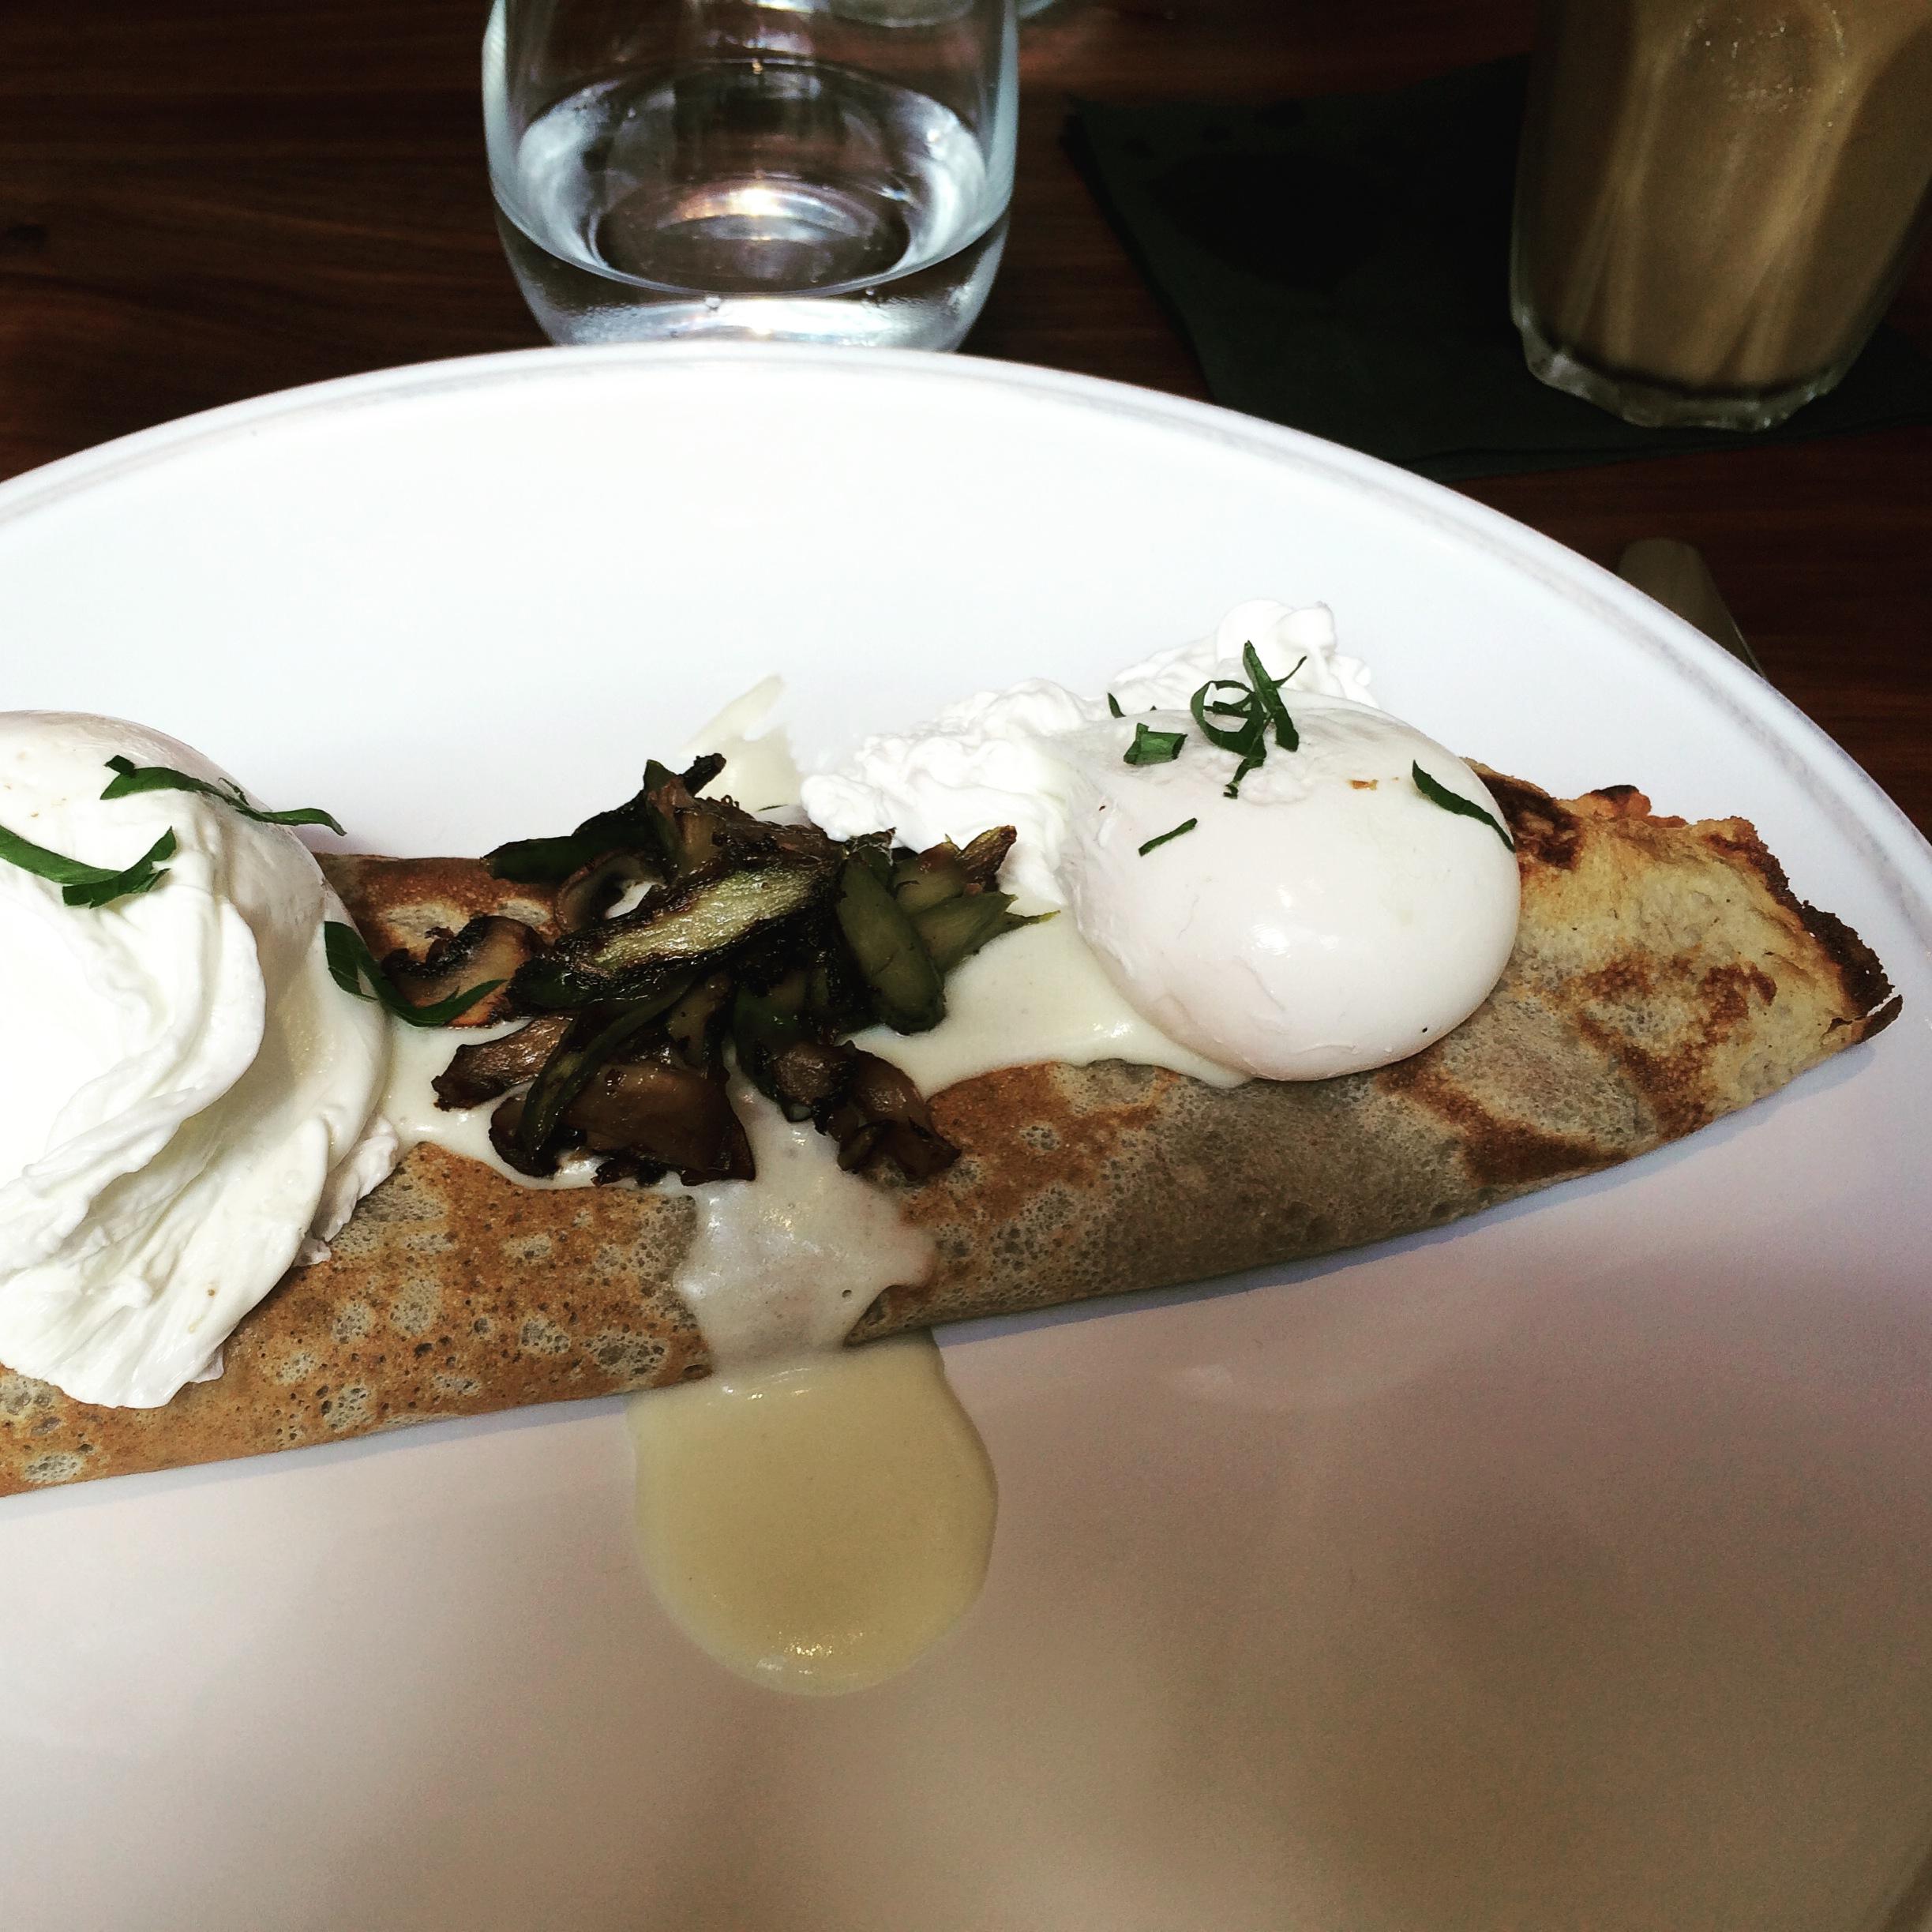 Buckwheat crepes for breakfast